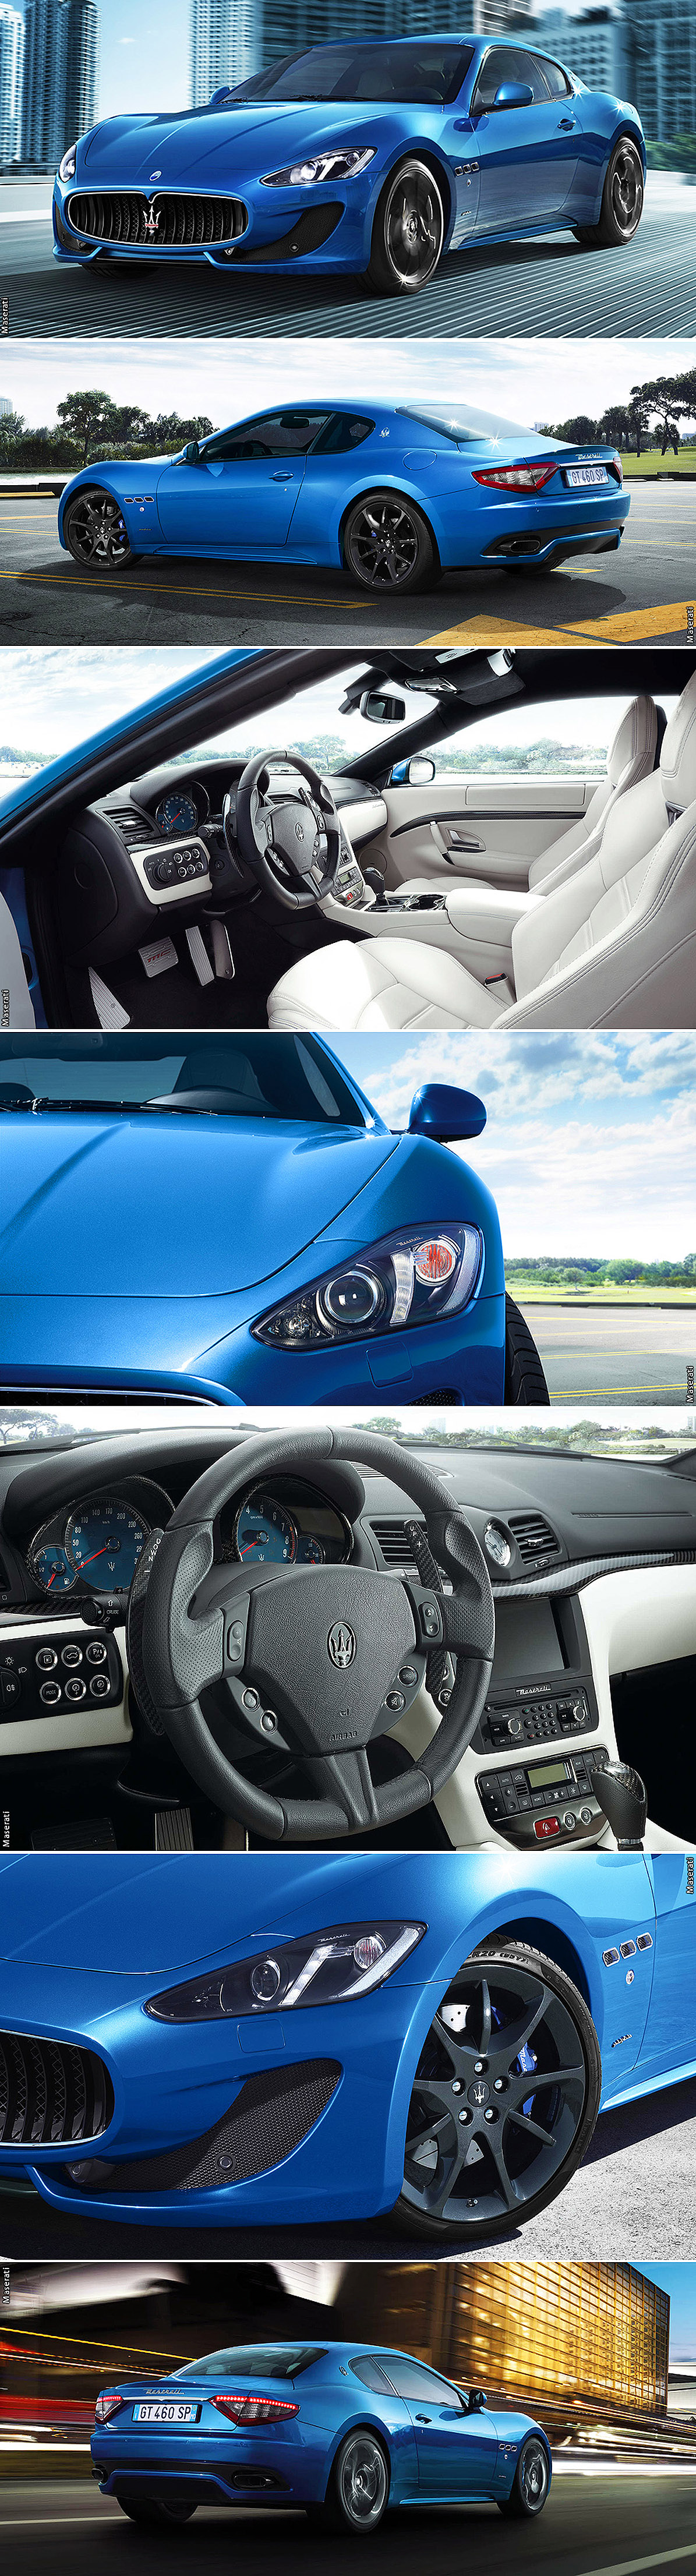 Maserati GTurismo=